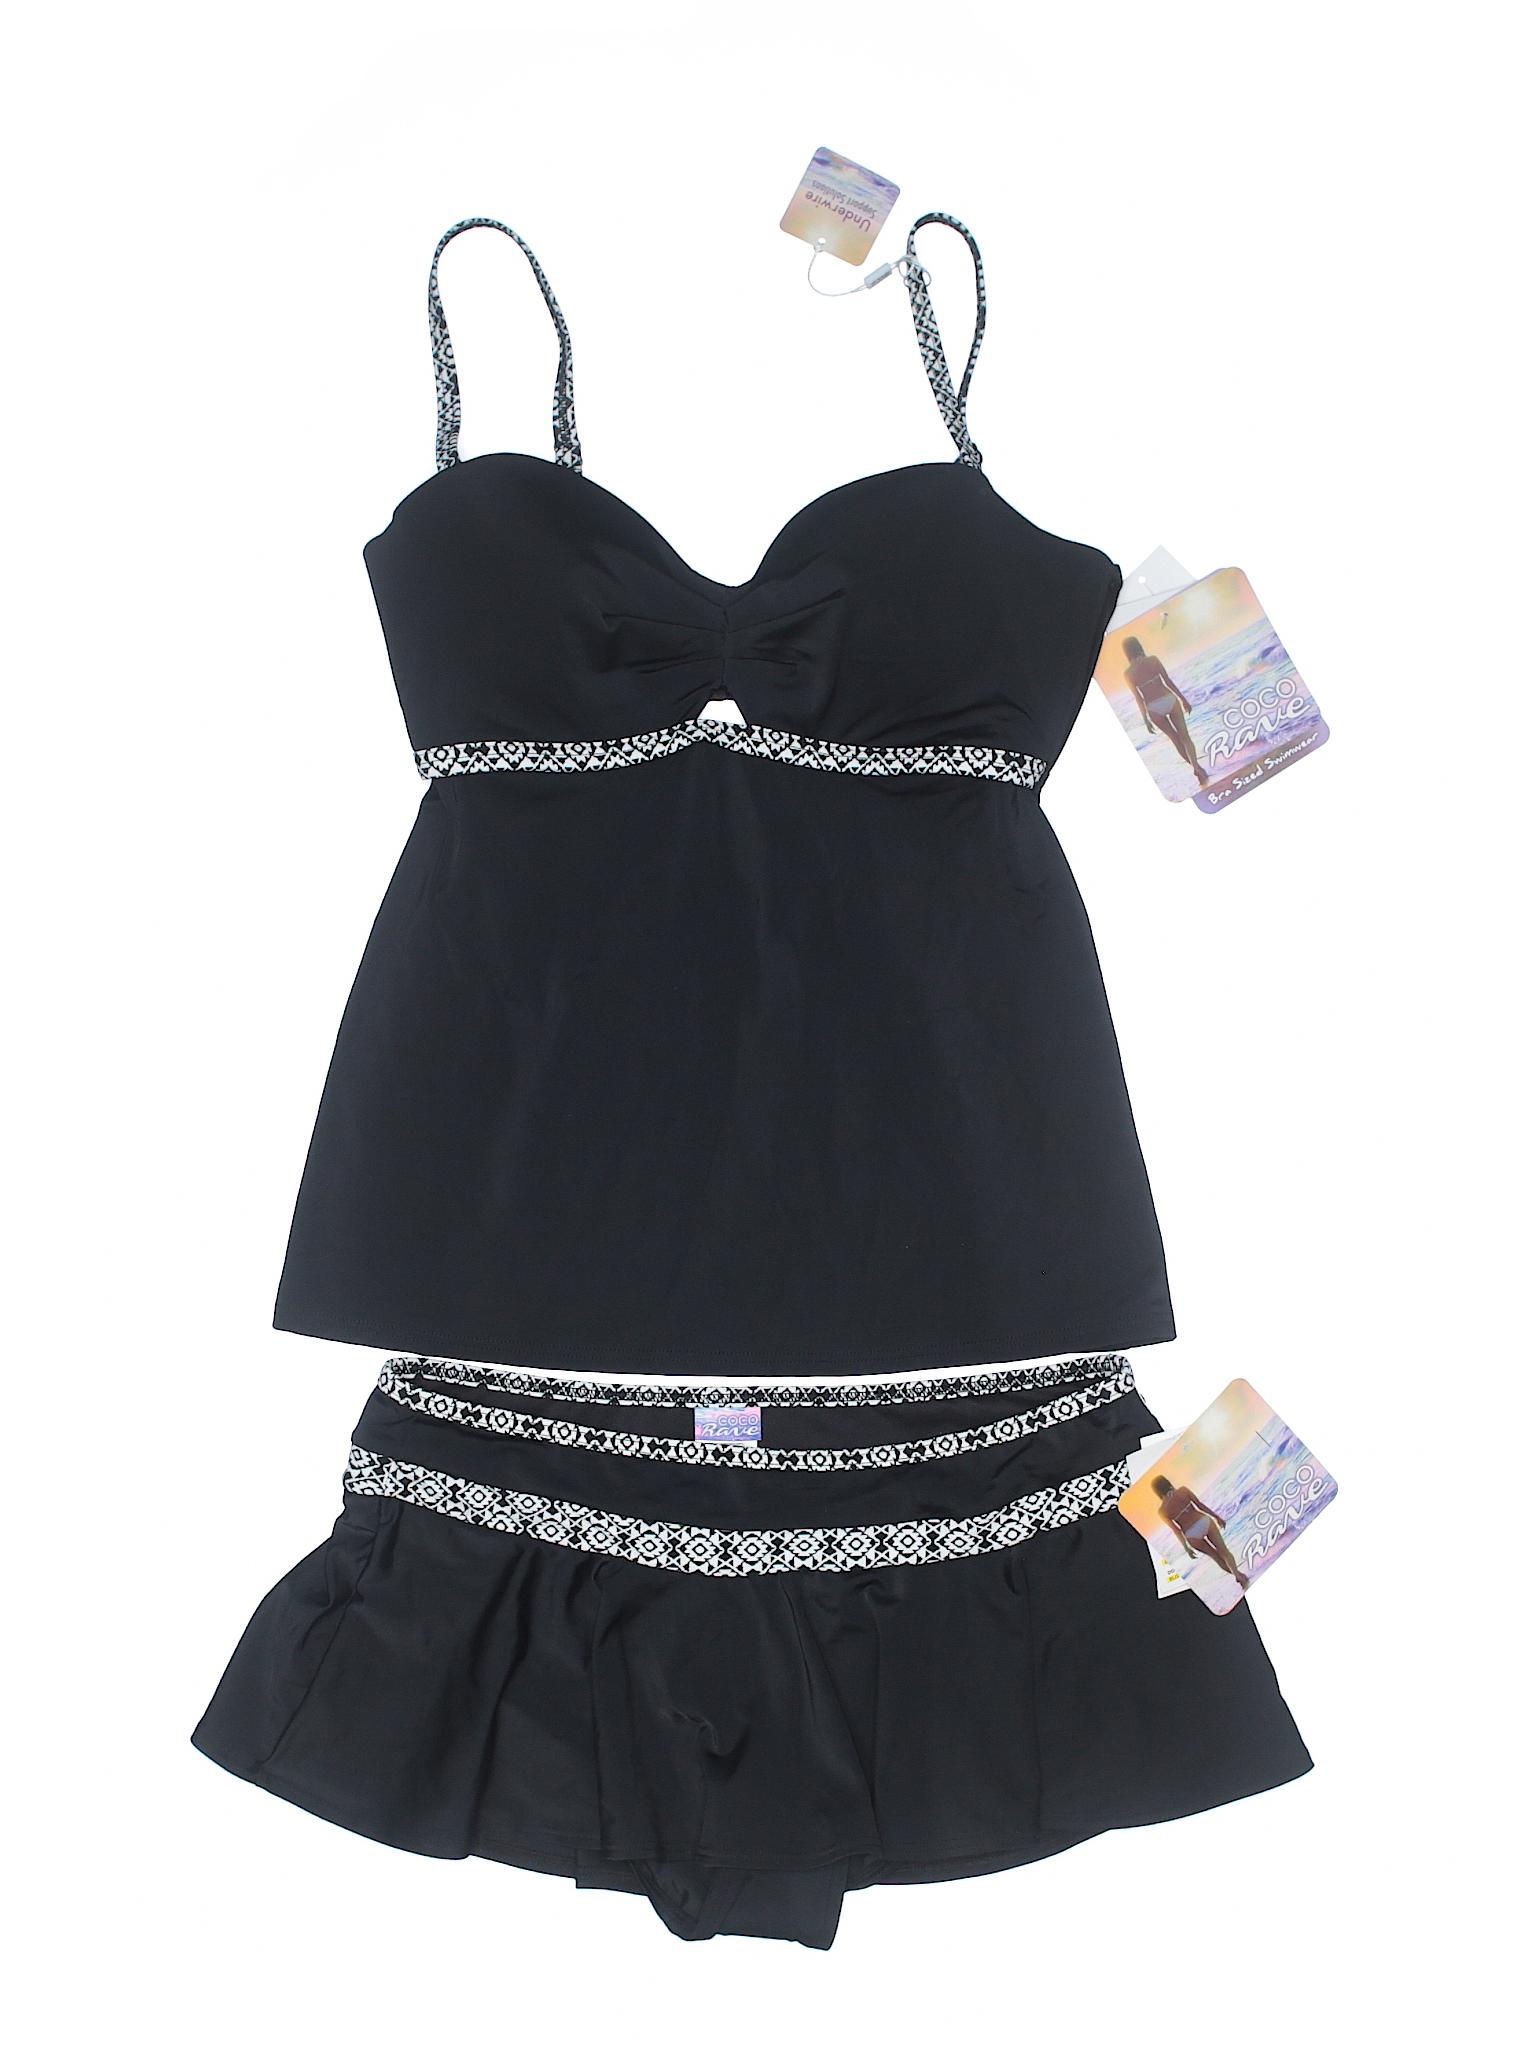 Rave Two Piece Boutique Swimsuit Coco S5qnYz